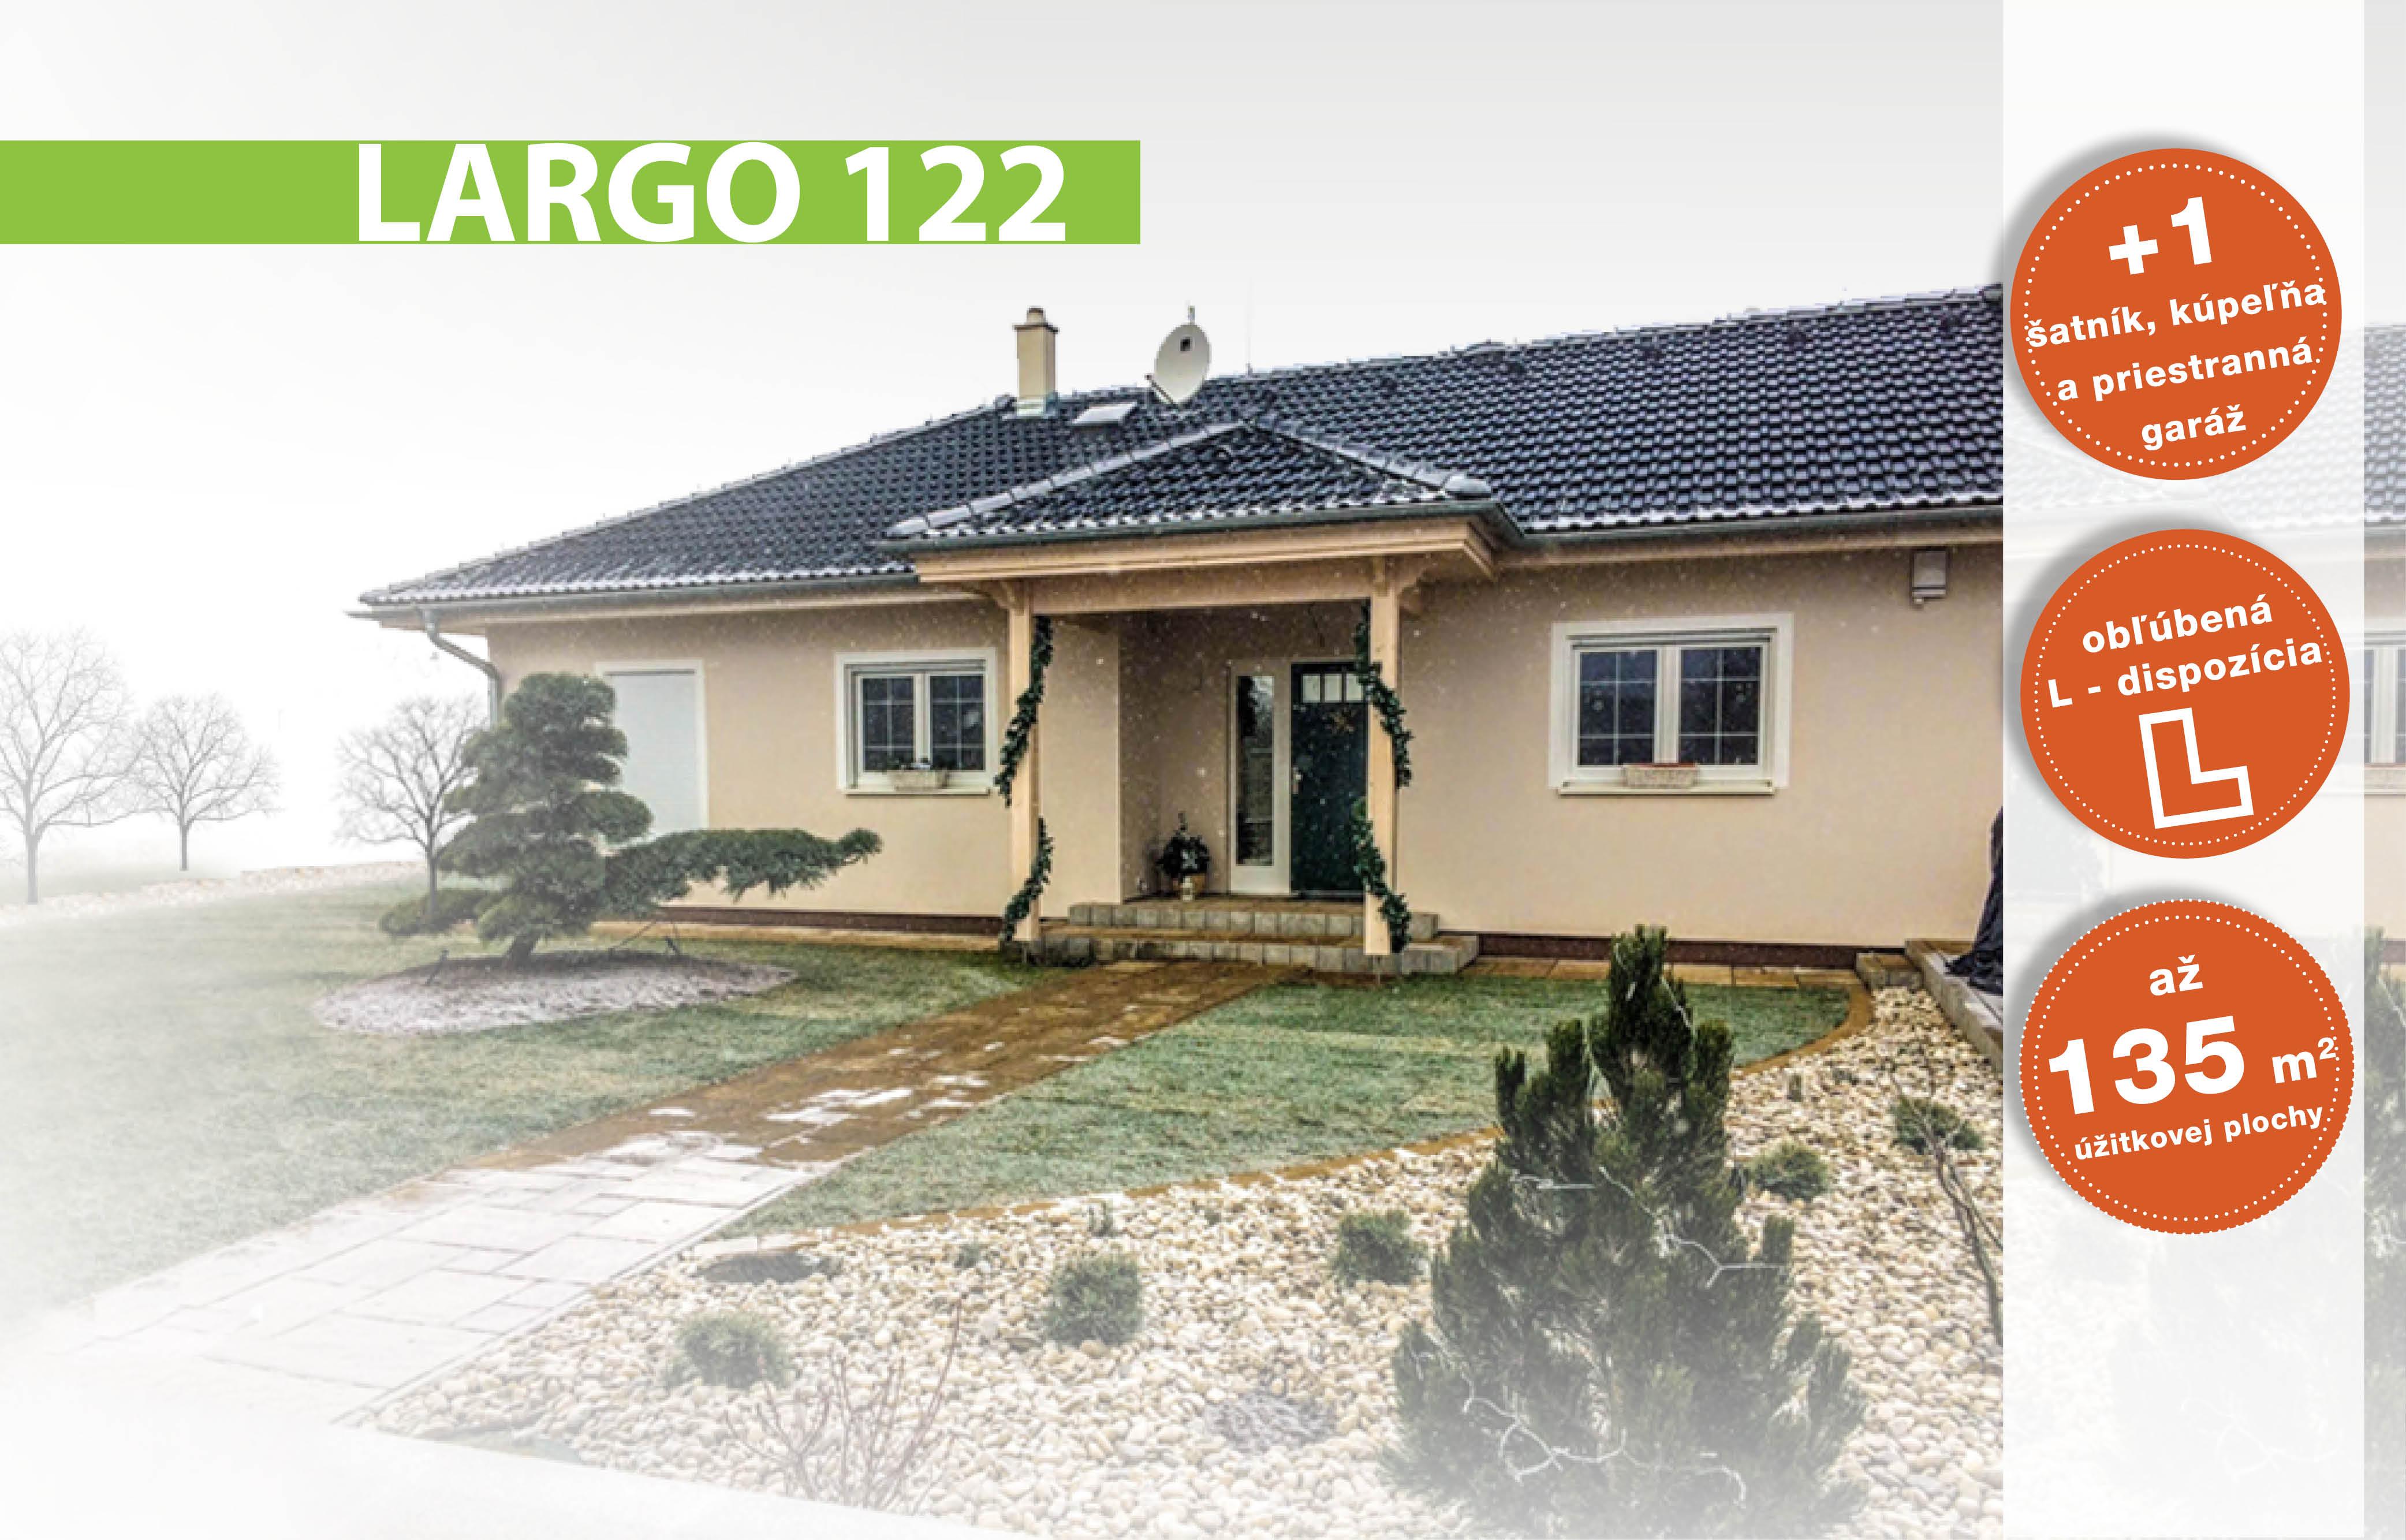 Largo 122 bungalov na mieru